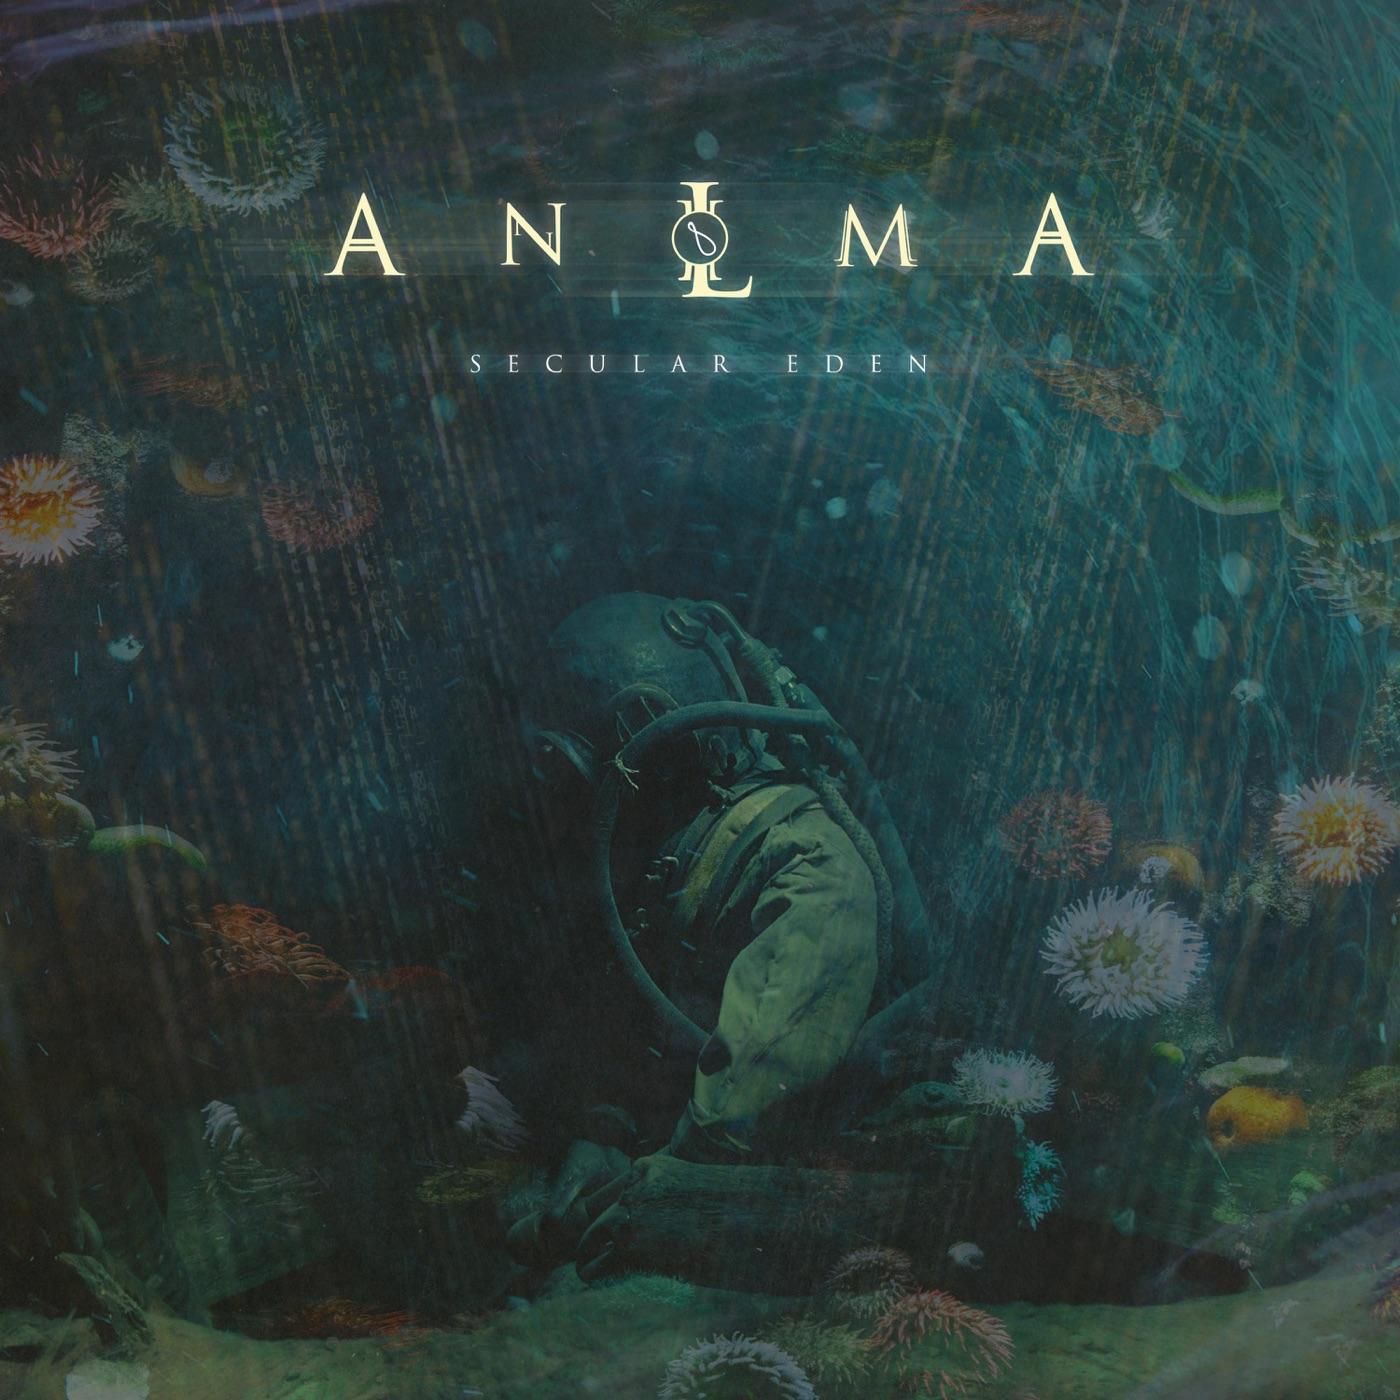 Anlma - Secular Eden (2019)